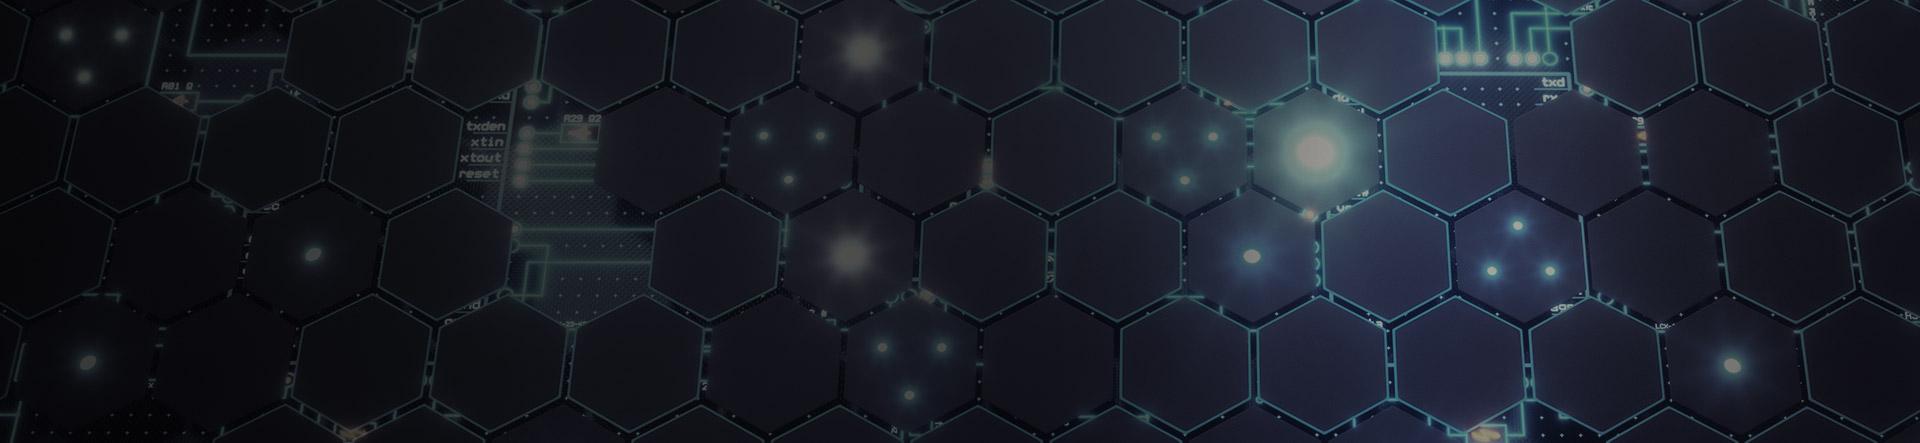 hexagon tiles over digital circuit board